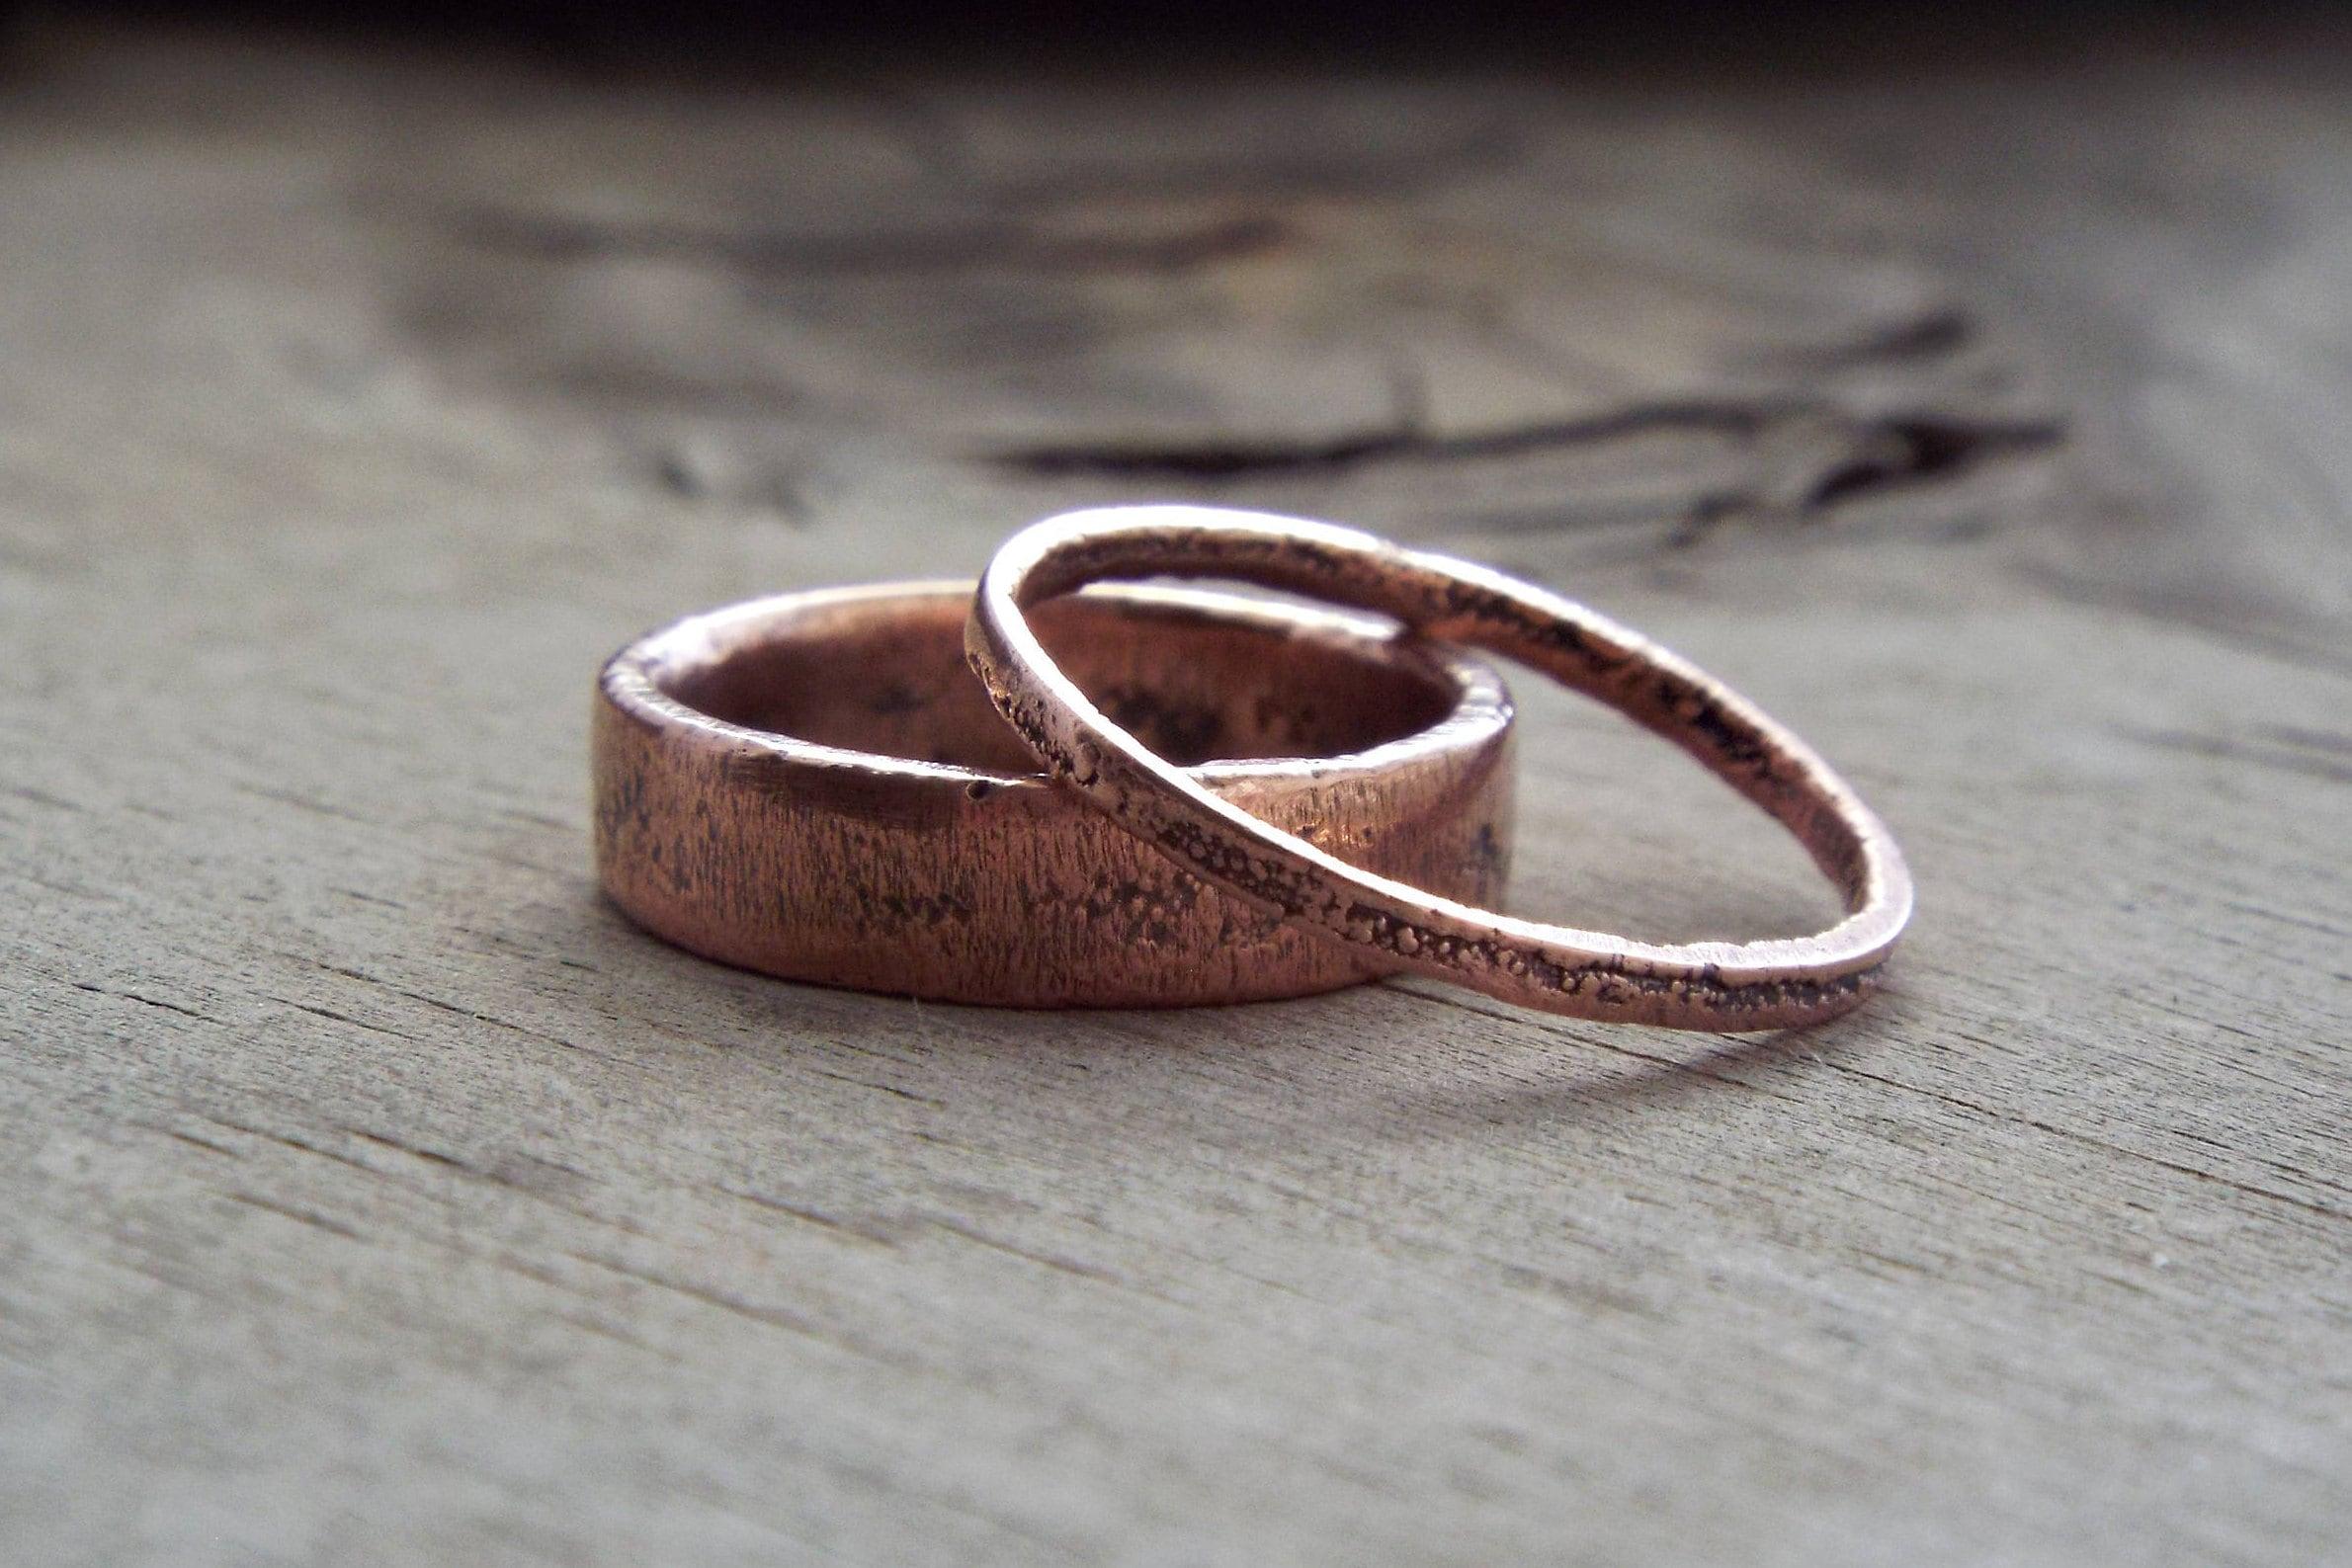 64376da9fdde7 Textured Copper Wedding Bands | Copper Electroformed Rustic Wedding Bands |  Made to Order